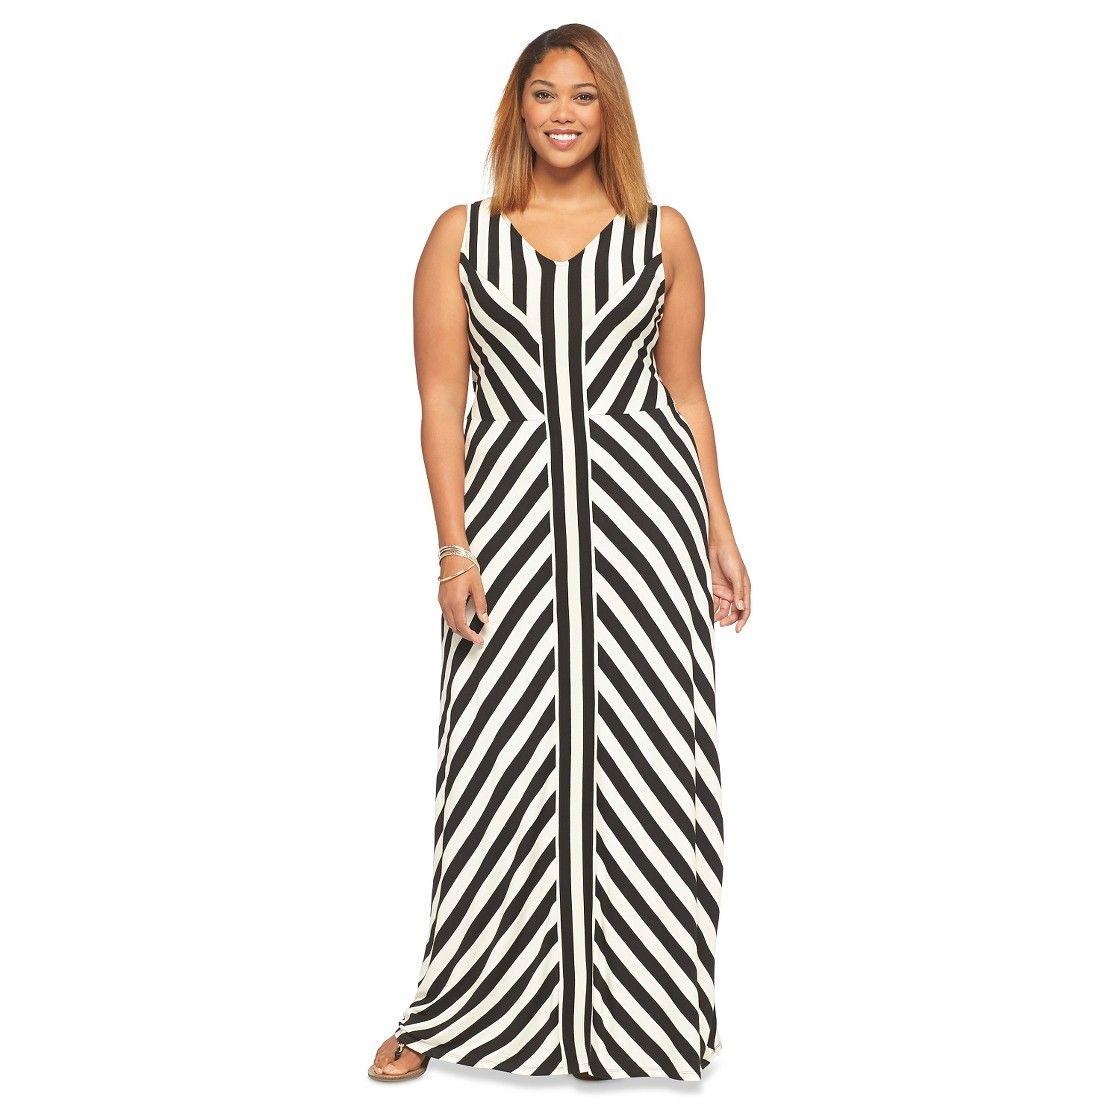 Women S Plus Size Sleeveless Maxi Dress Ava Maxi Dress Plus Size Maxi Dresses Full Figure Outfits [ 1120 x 1120 Pixel ]